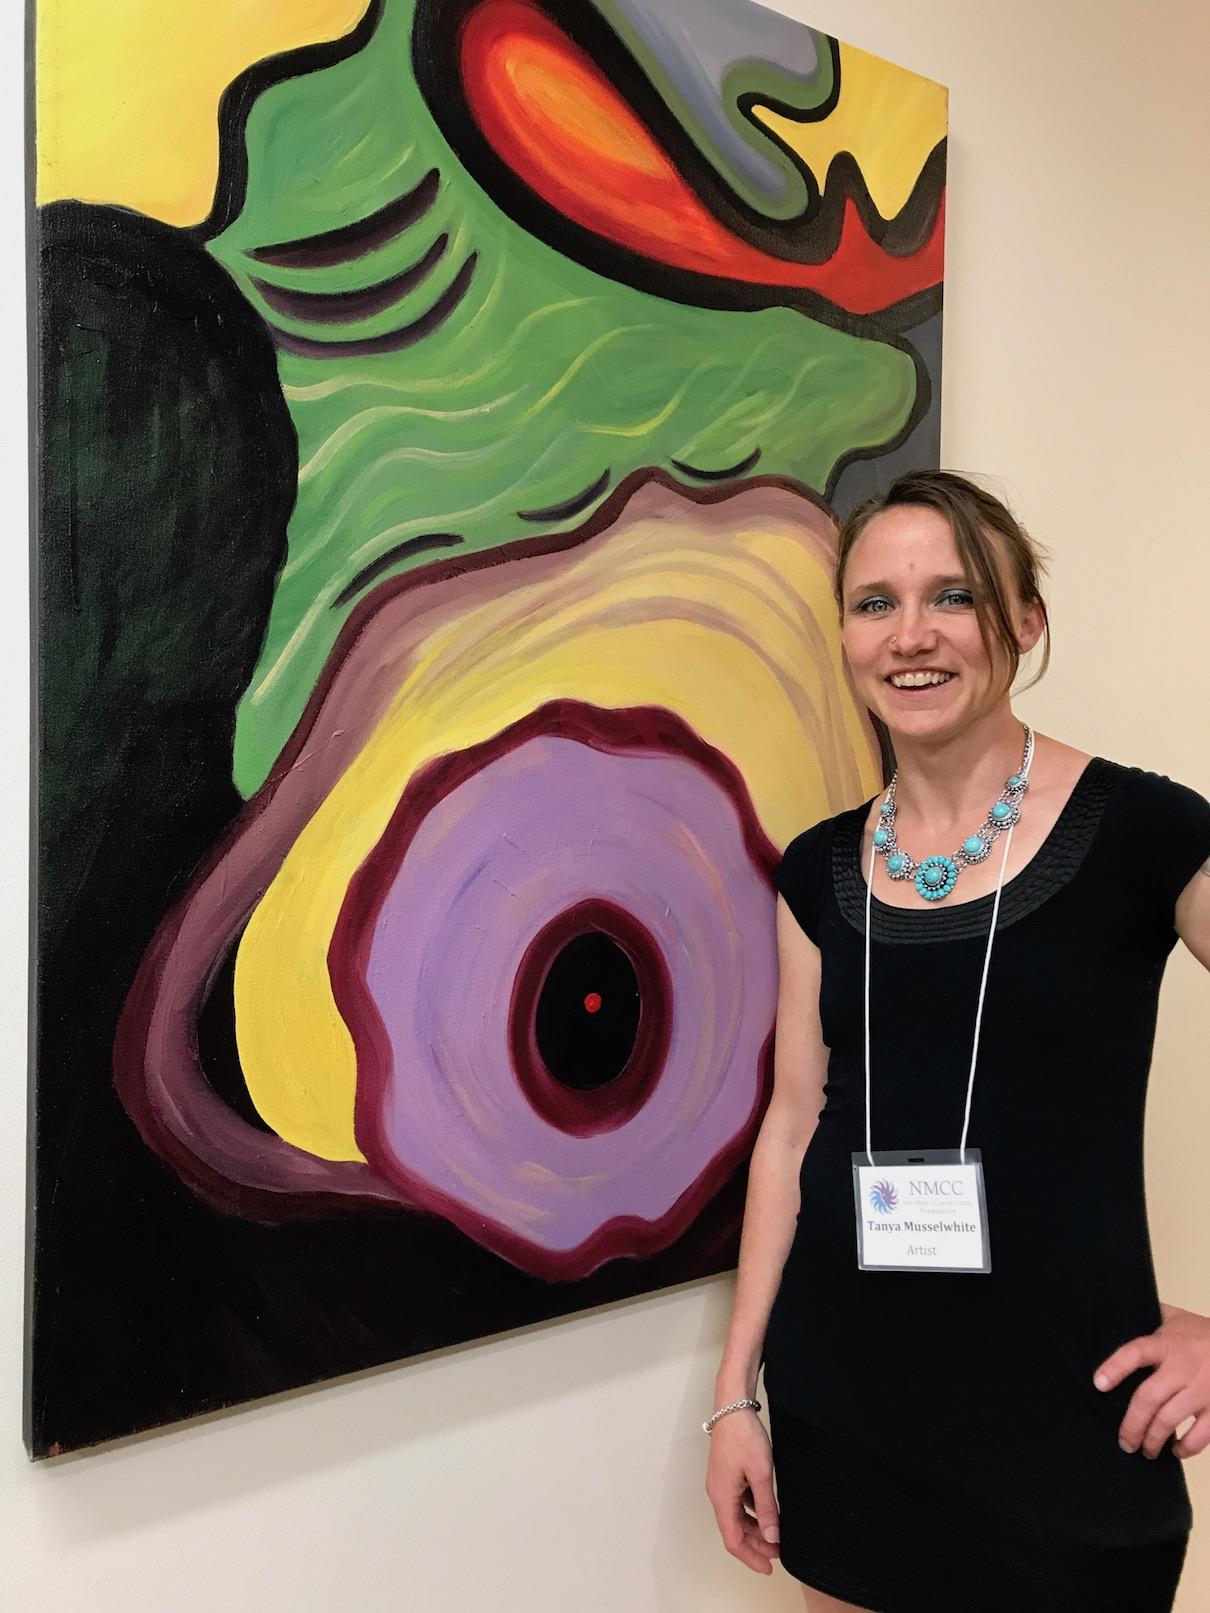 Tanya Musselwhite, artist